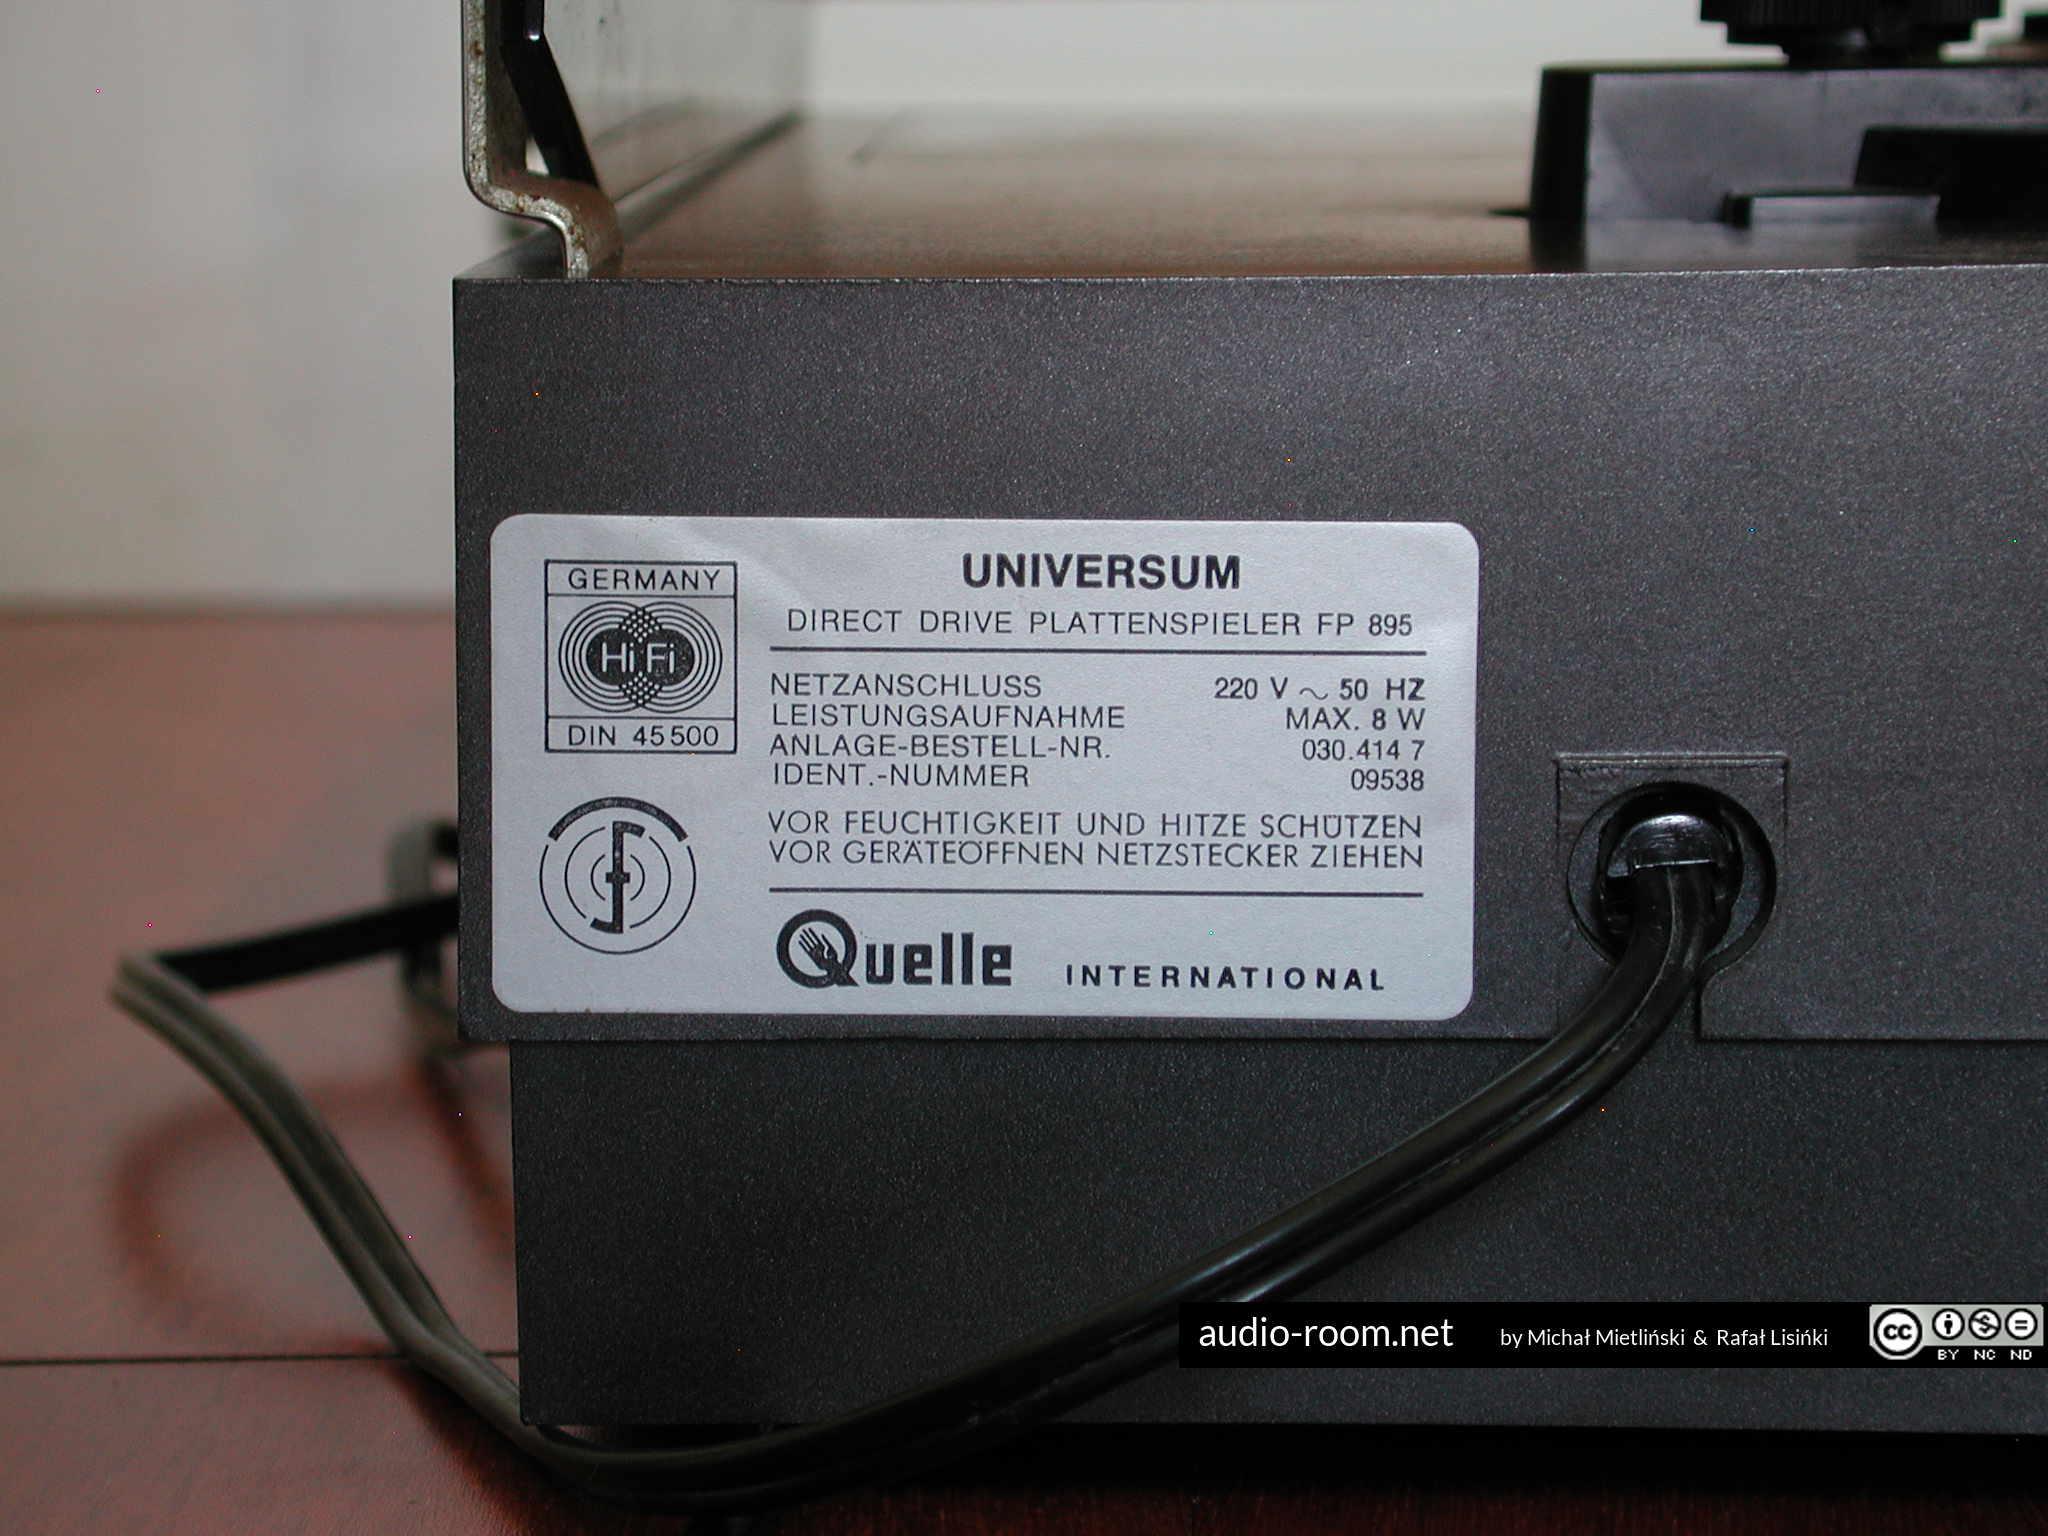 universum-fp-895-b-dscn4358